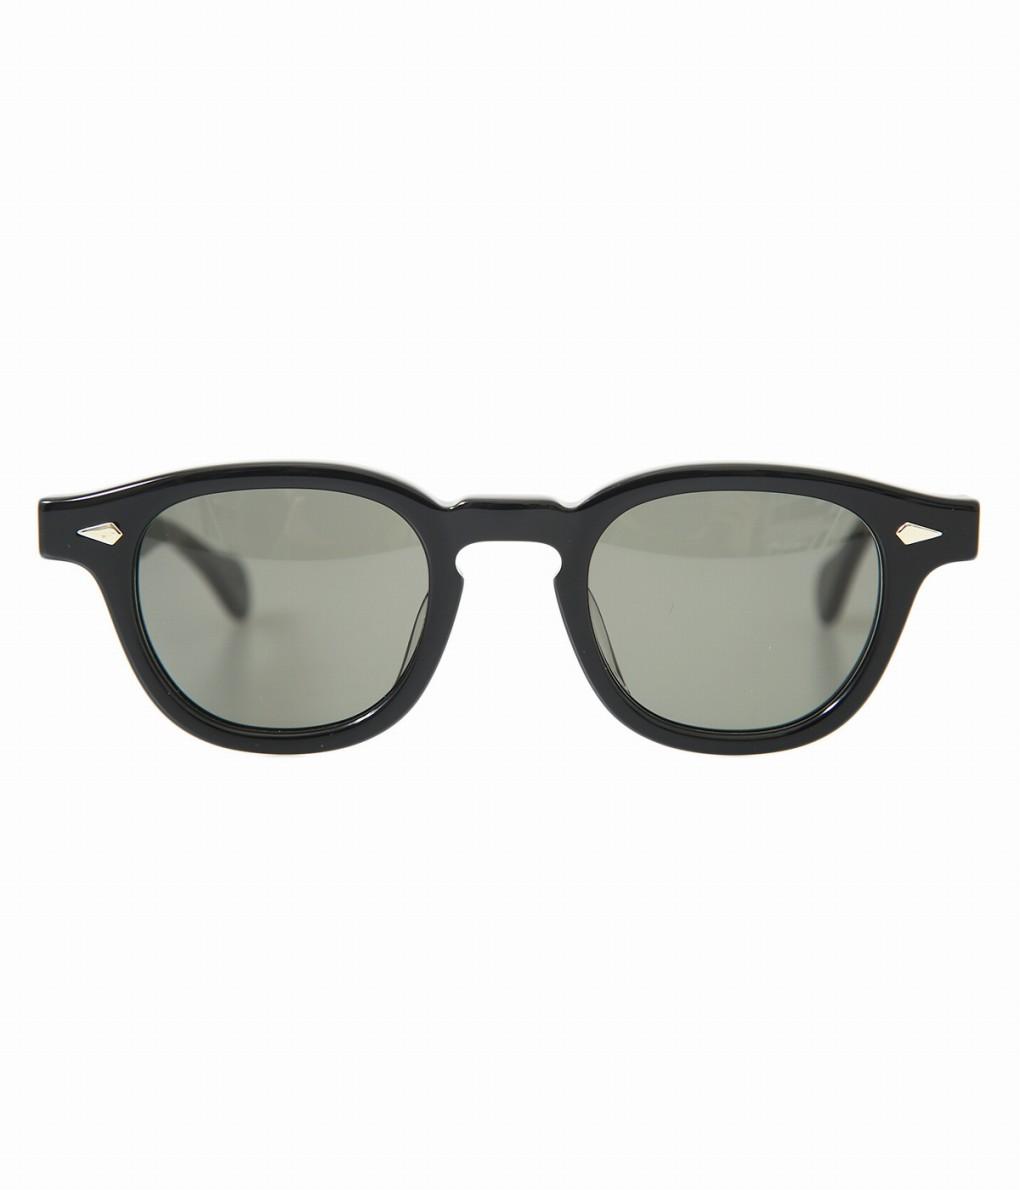 JULIUS TART OPTICAL / ジュリアスタートオプティカル : AR 42(size) 44(size) 46(size) - BLACK / G-15 - : サングラス アクセサリー メガネ メンズ 眼鏡 : JTPL-009A-T-1A-T-2A-T【WIS】【COR】